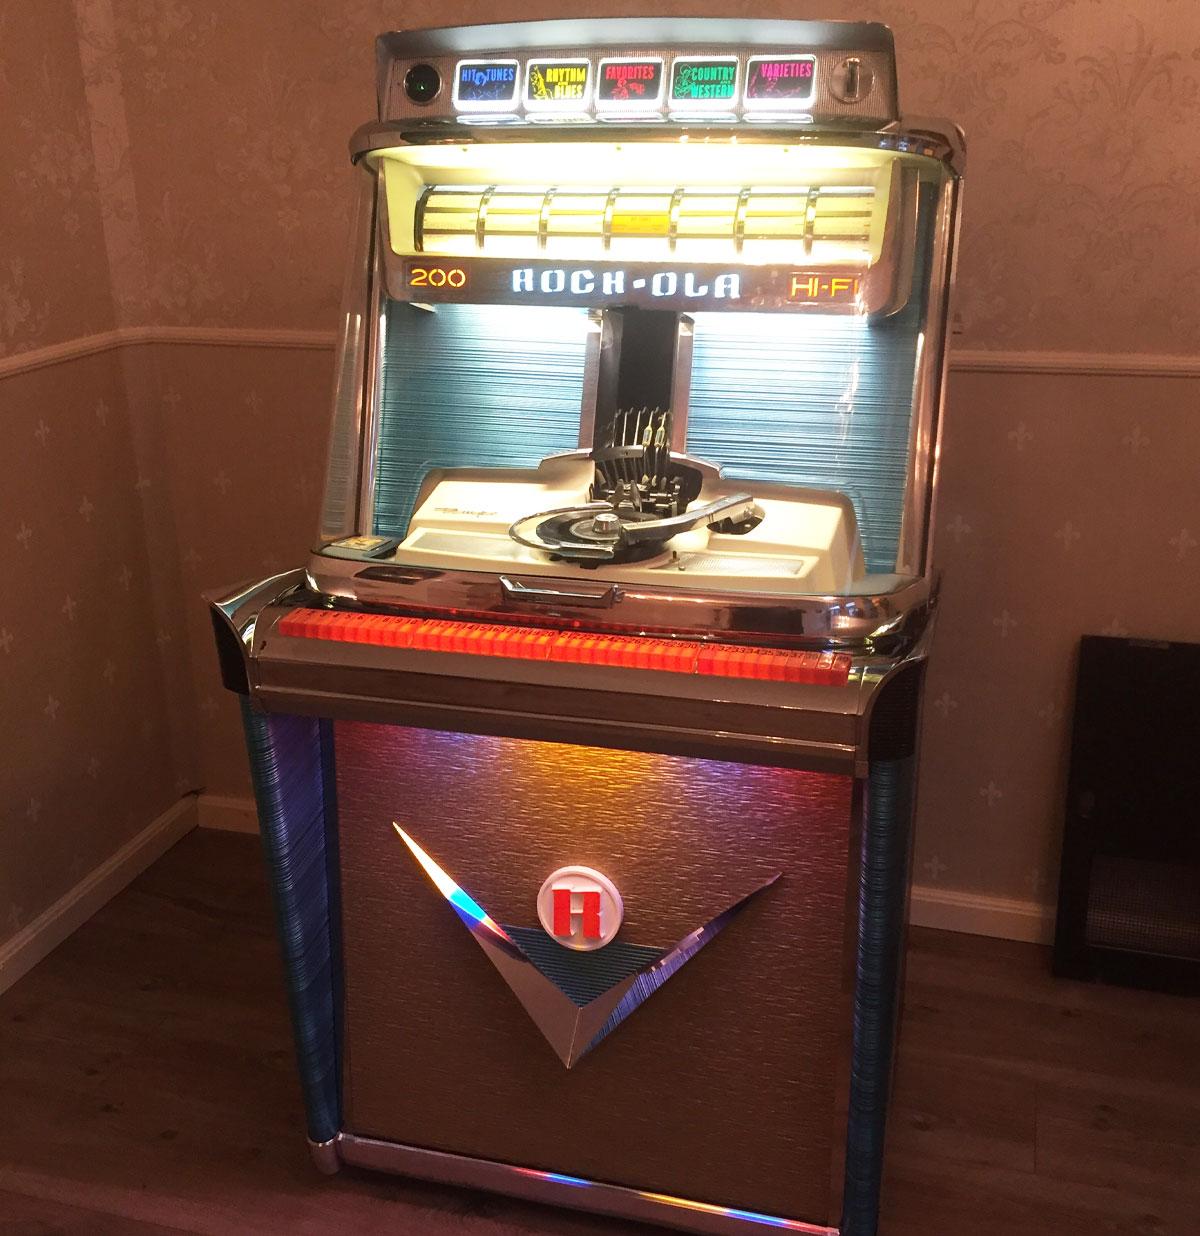 Jukebox Rock-Ola 1475 - Tempo 1 - 200 select 1959